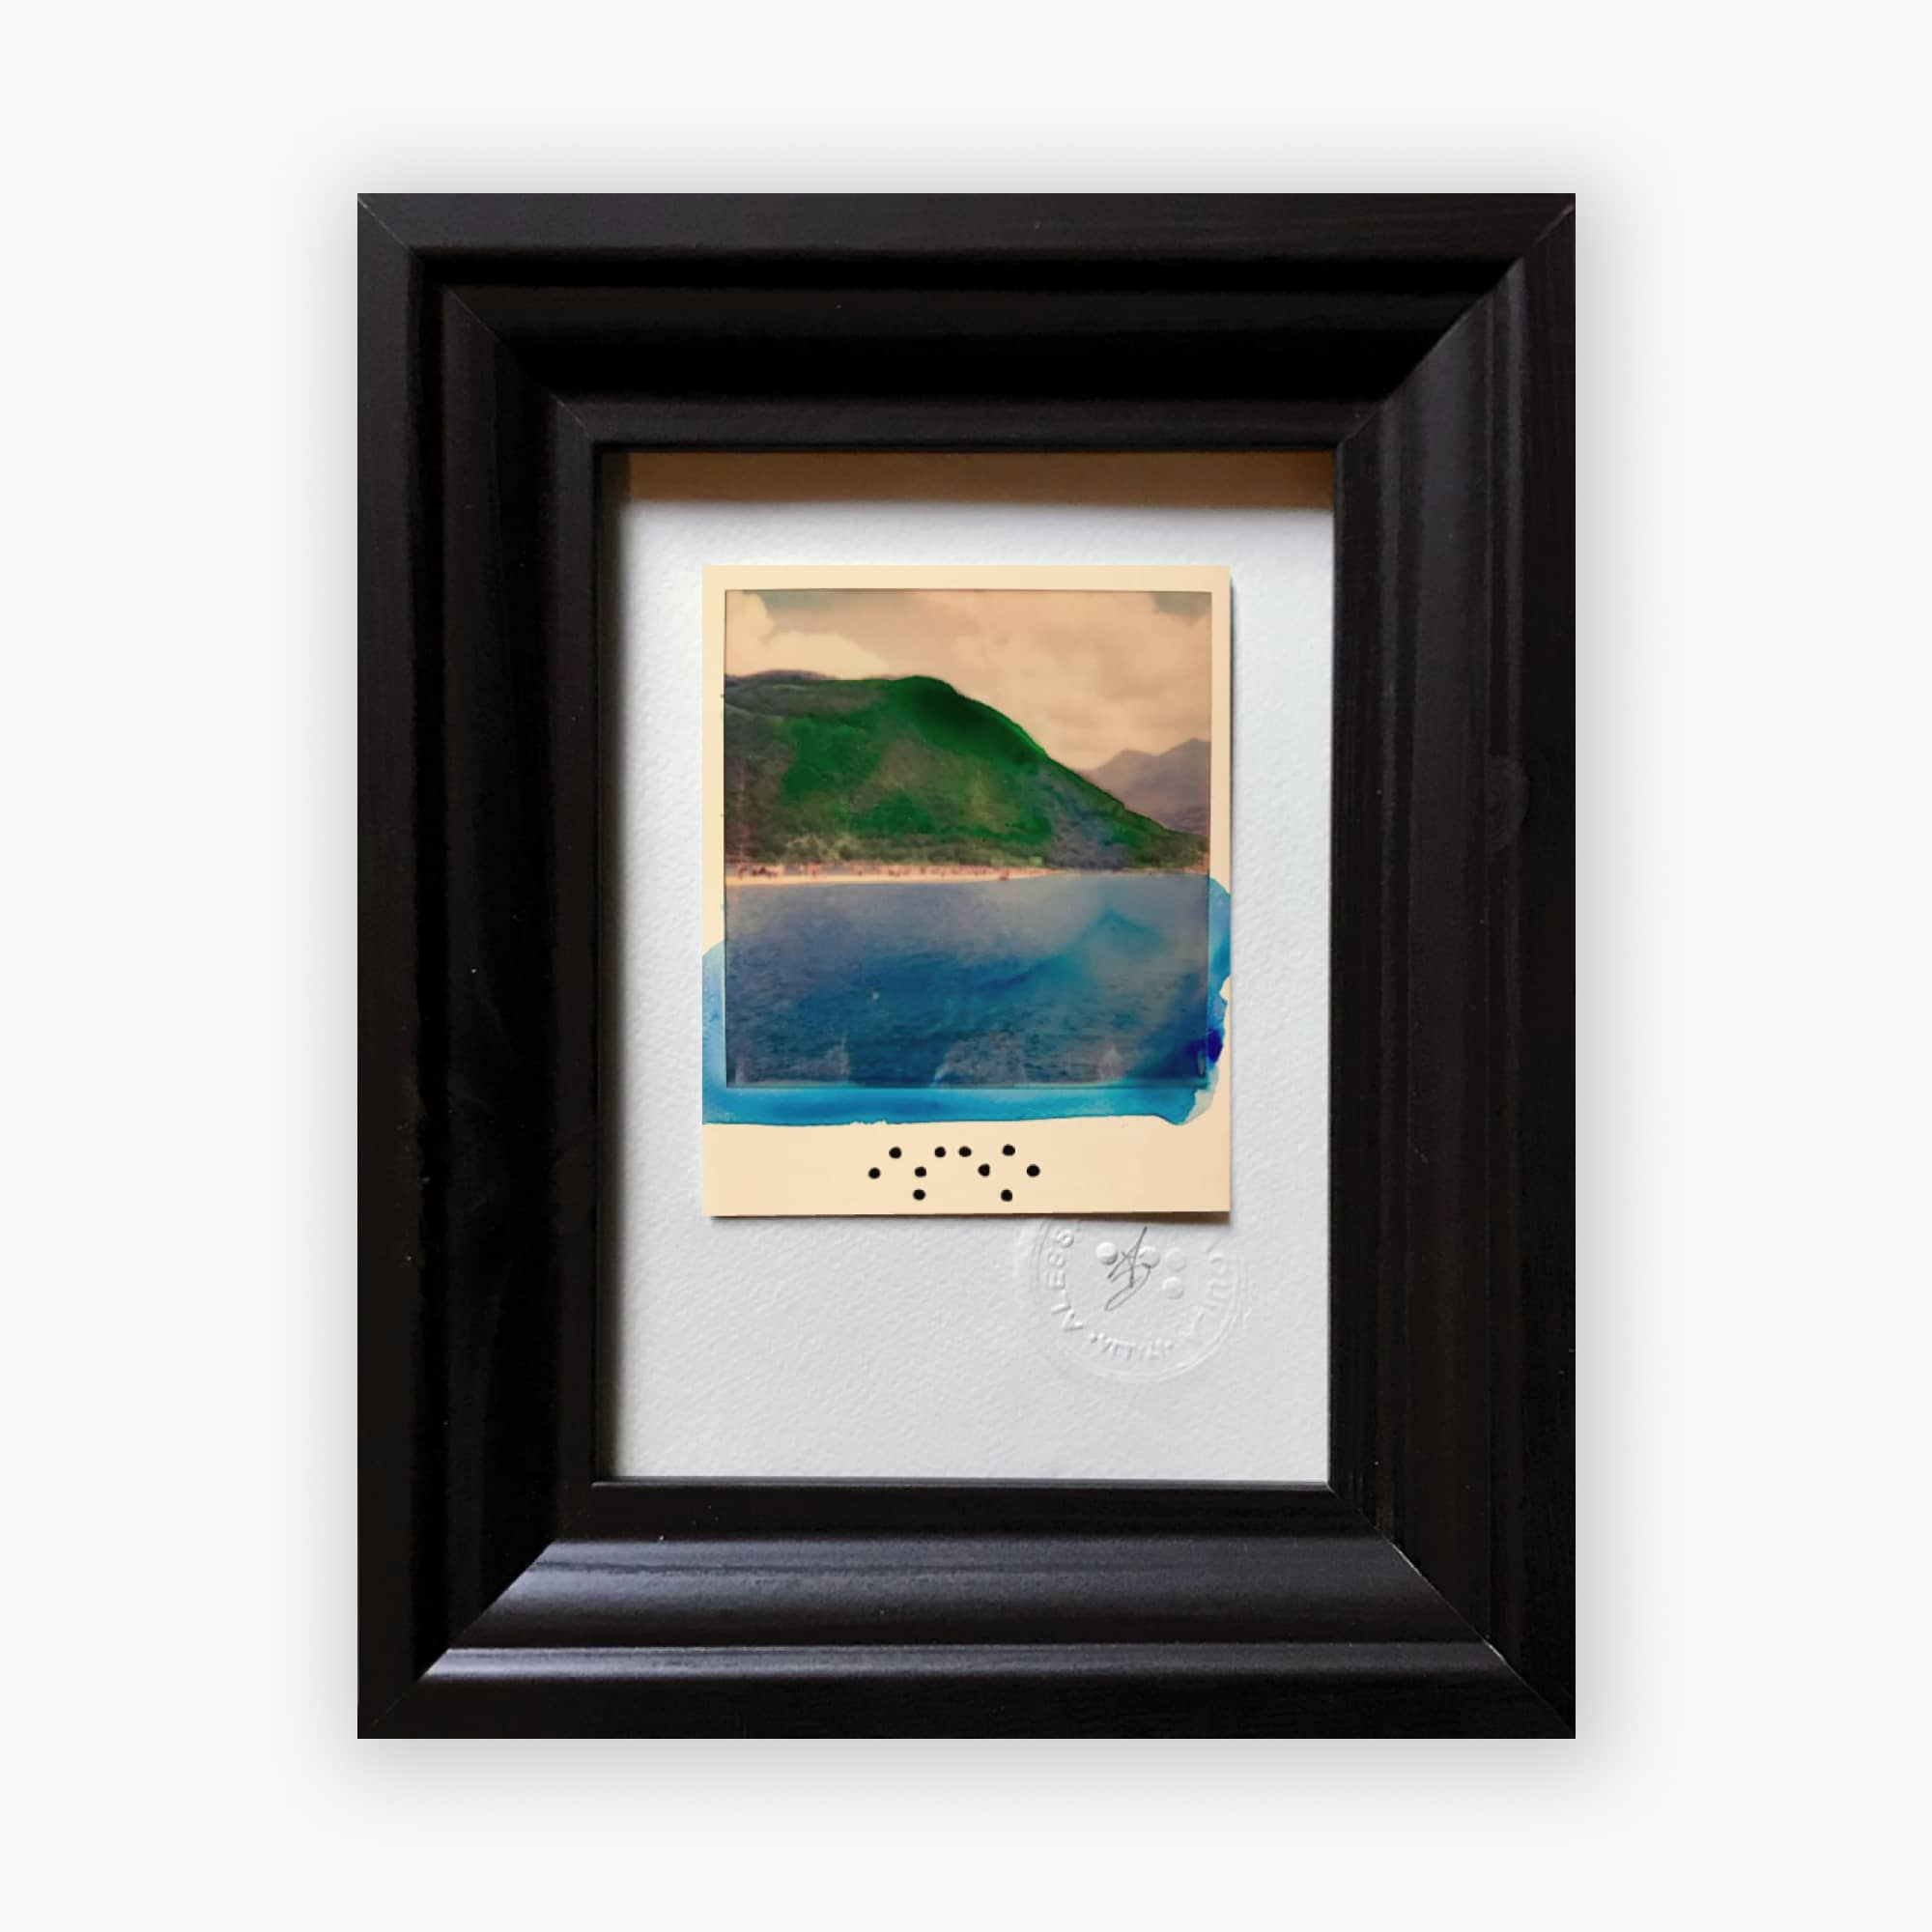 The Floating Polaroid #18